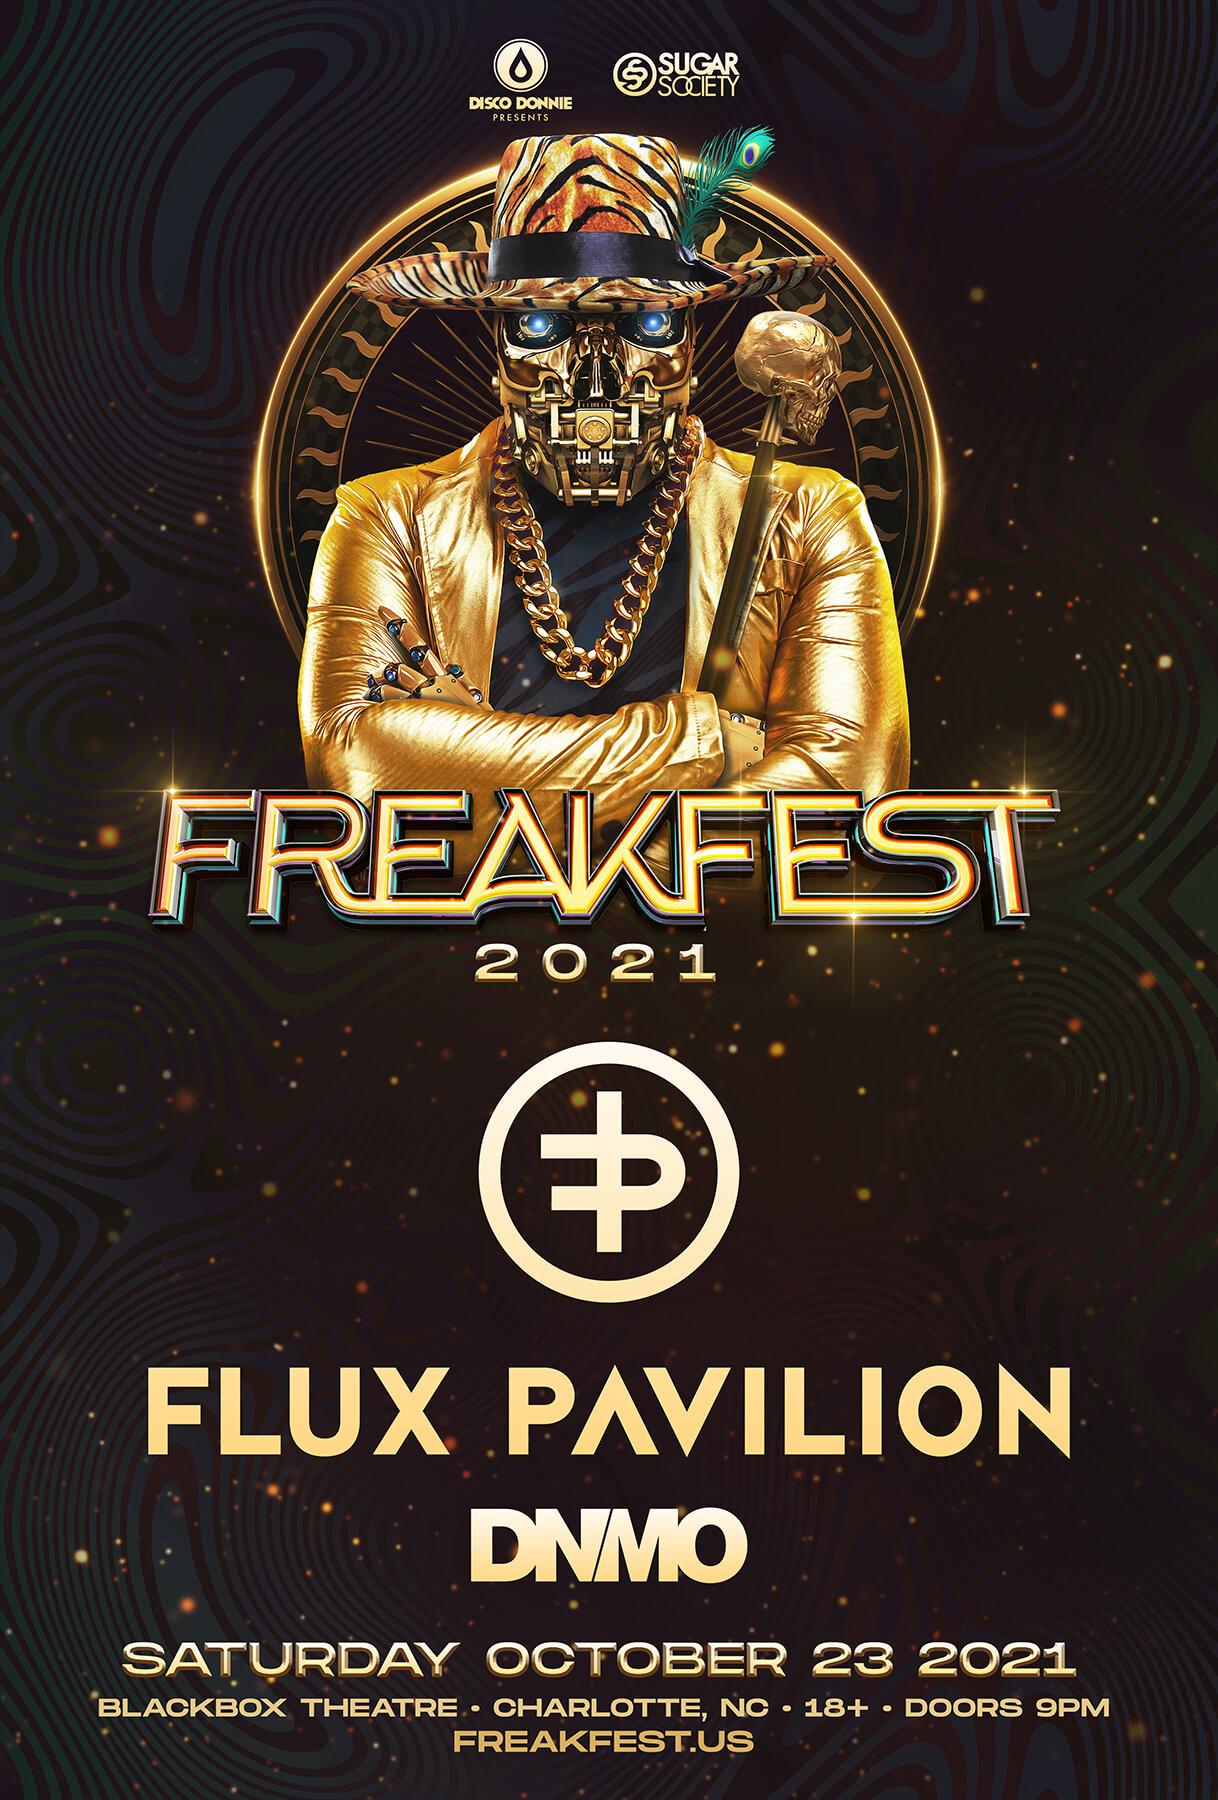 Flux Pavilion, DNMO in Charlotte